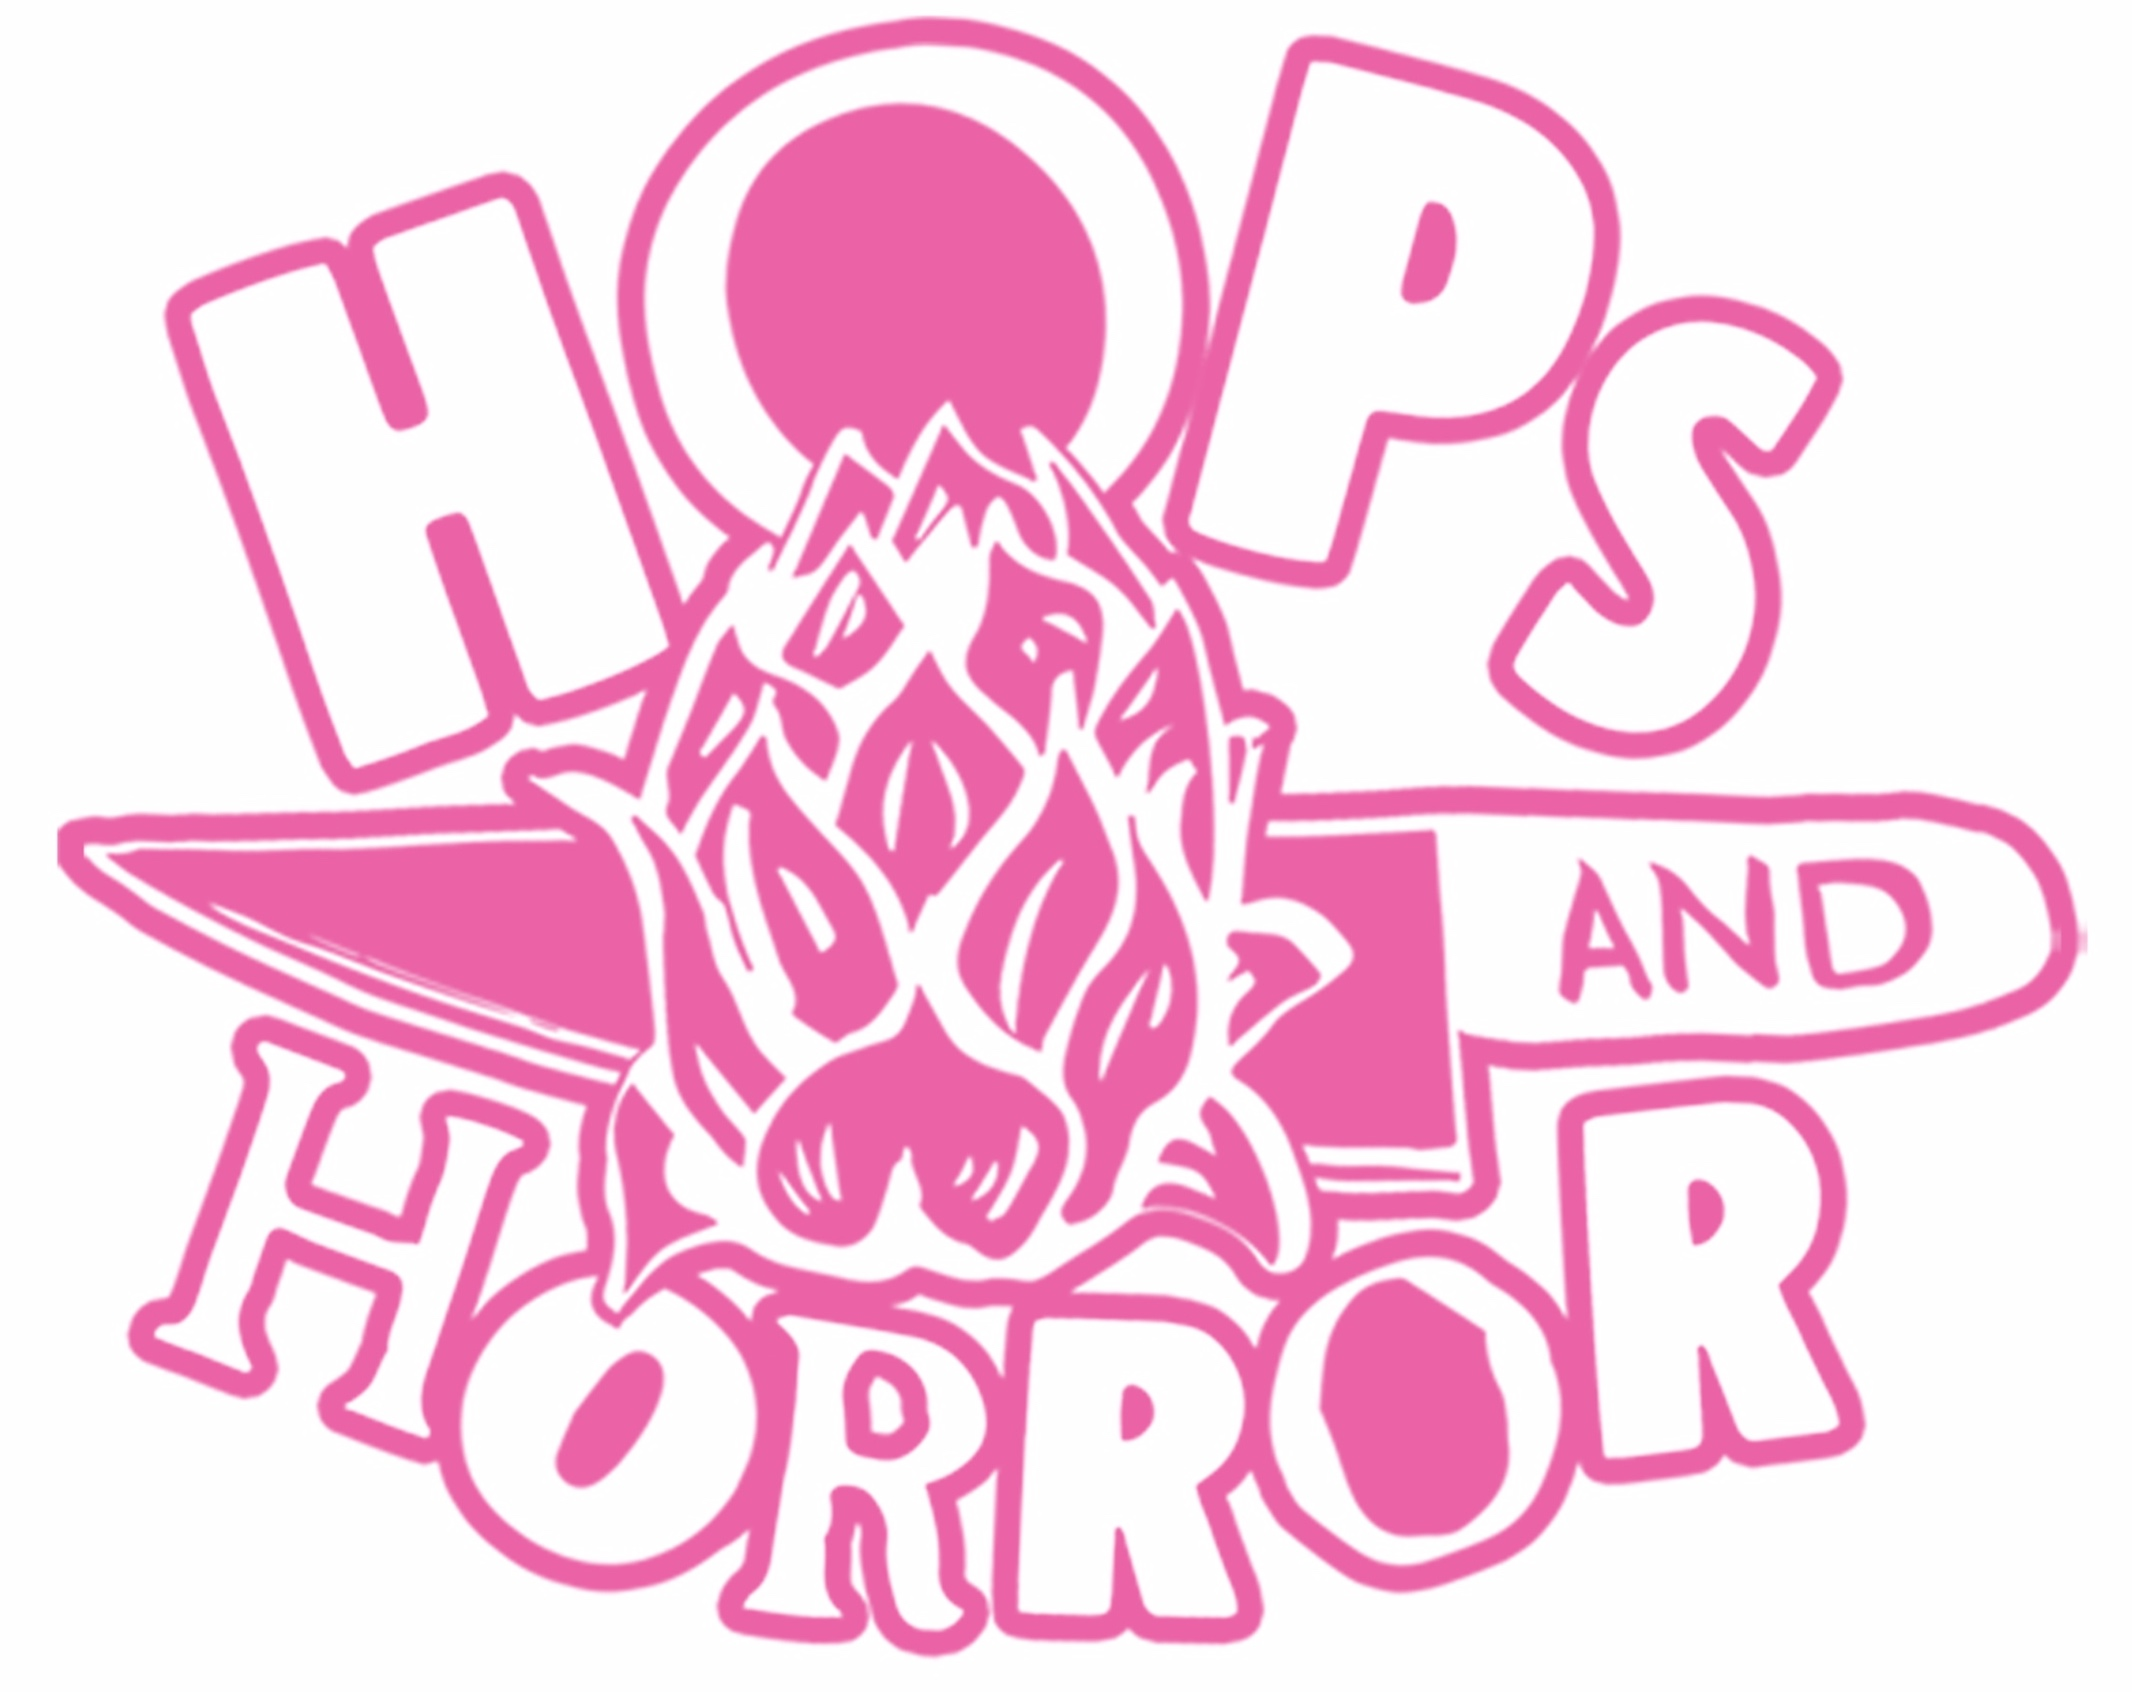 hopsAndHorrorSnagPosterPinkLogo.jpg